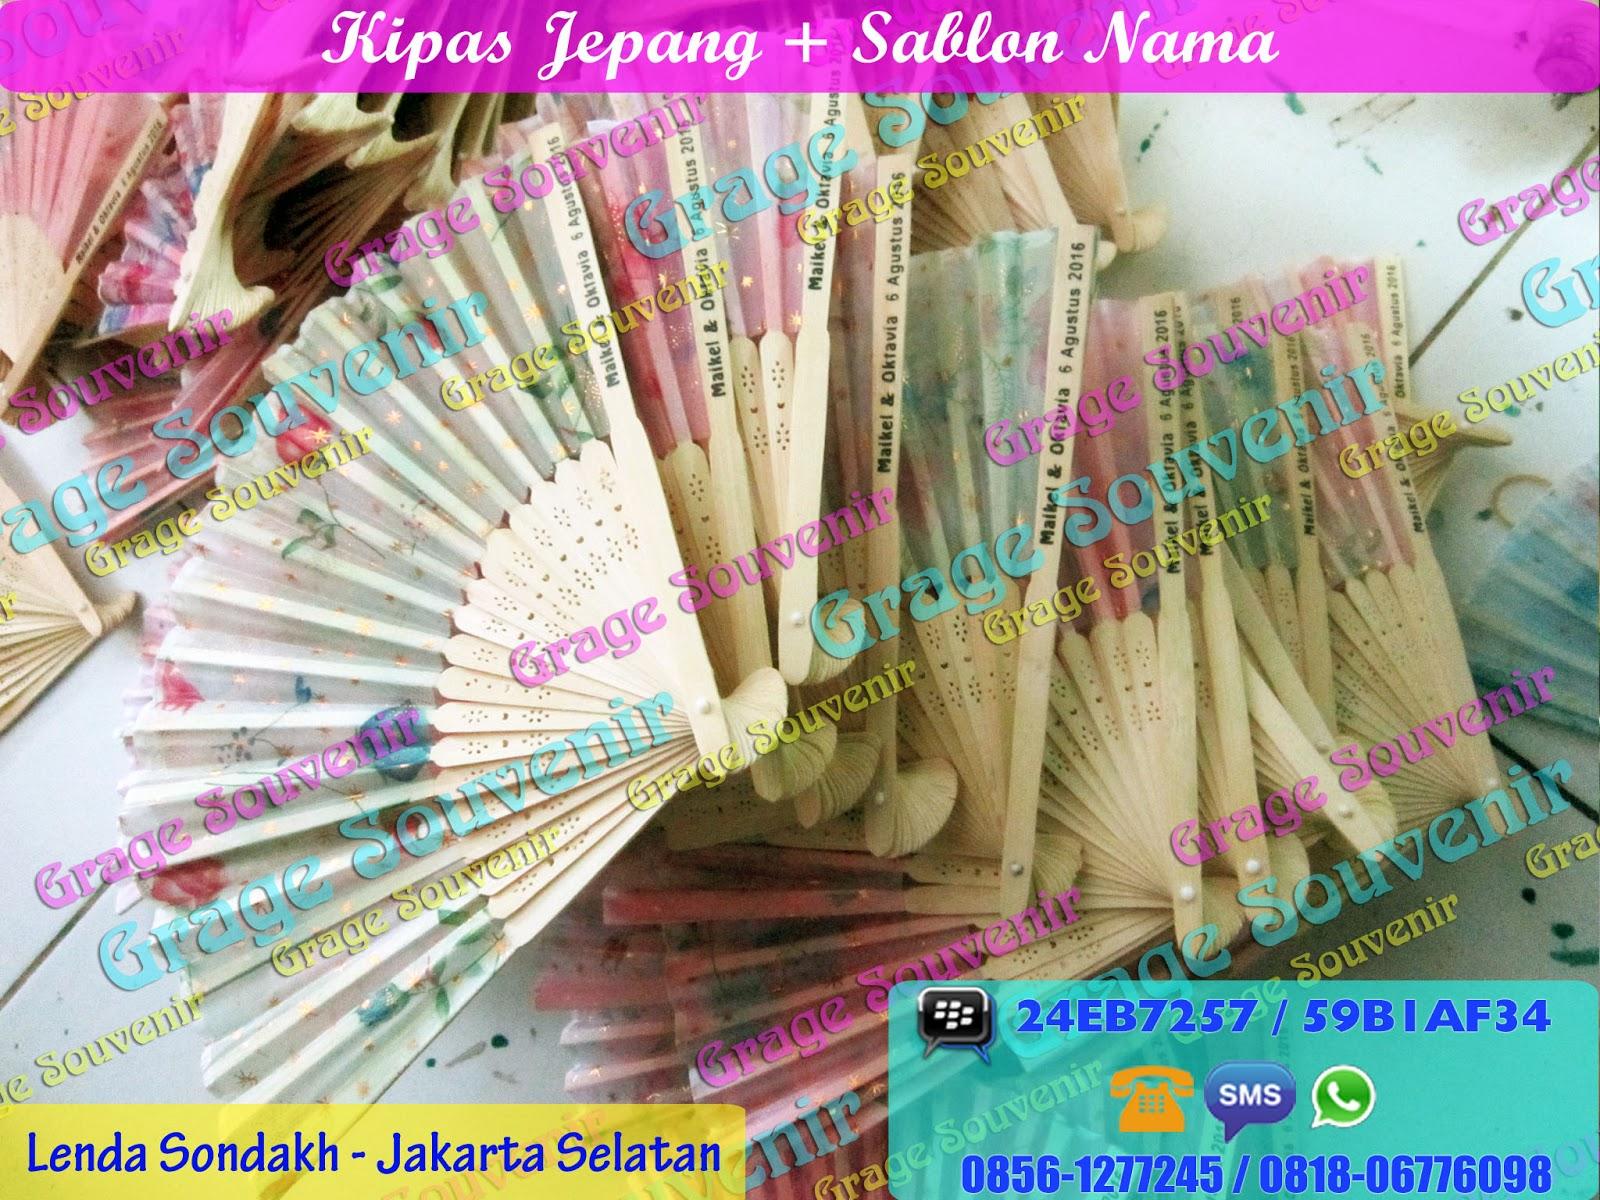 Jual Souvenir Pernikahan di Jakarta Selatan - Kipas Jepang